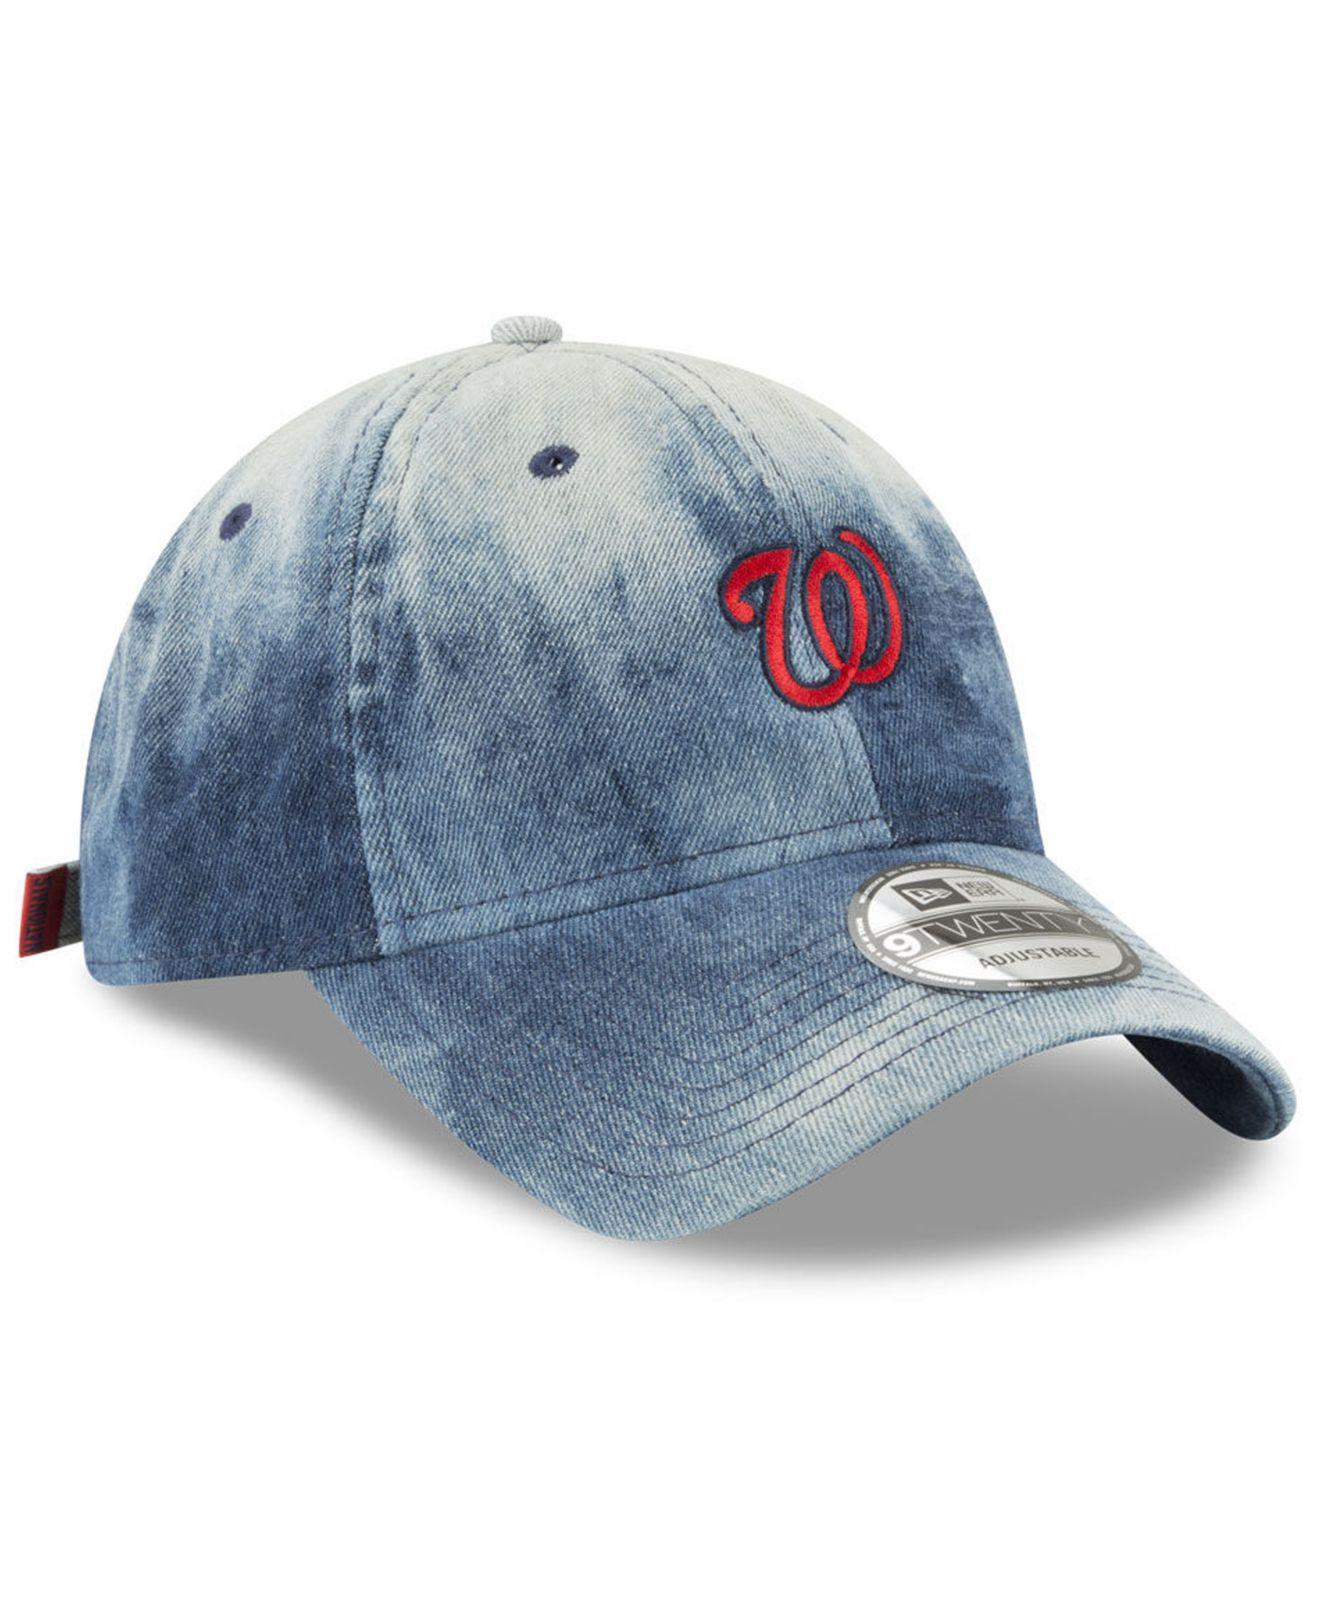 detailed look 05180 126de 26.00 4d224 dddd7  coupon for washington nationals denim wash out 9twenty  cap for men lyst. view fullscreen 4d2b7